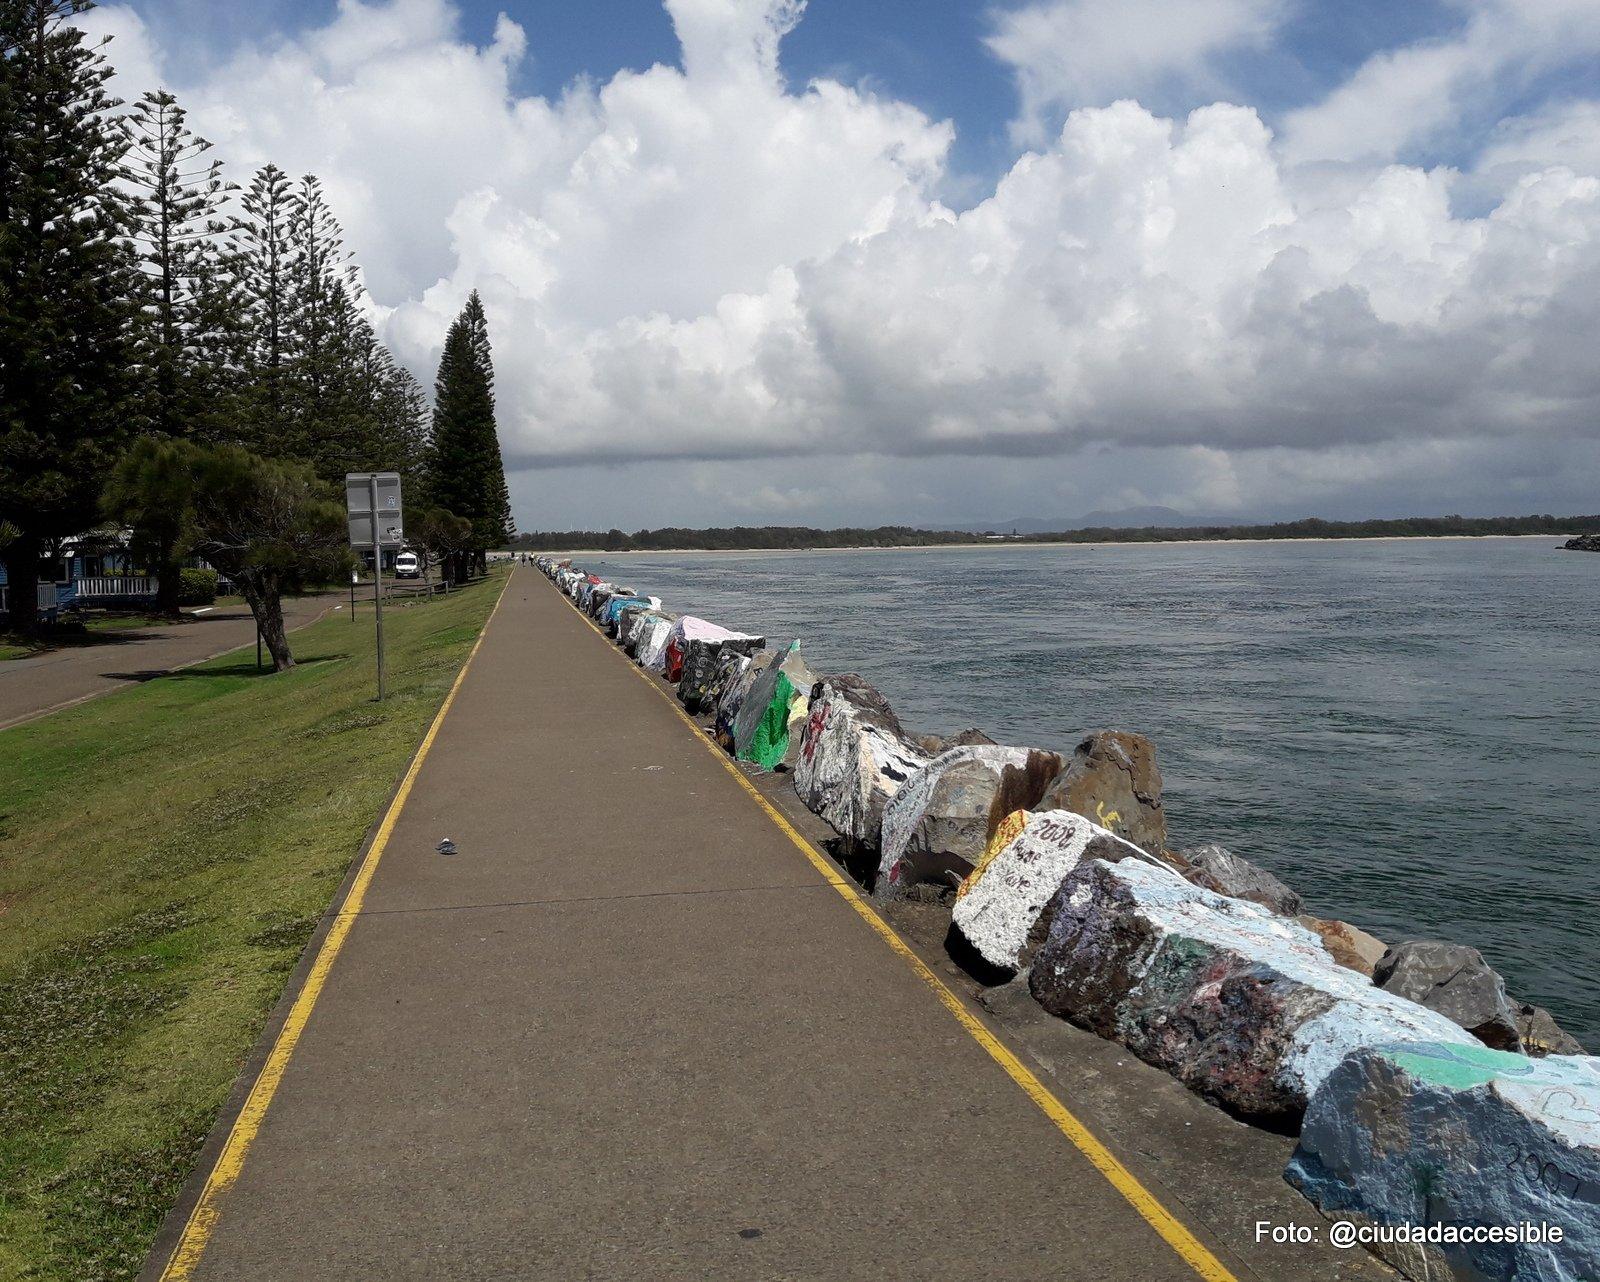 ruta peatonal en Parque Port Macquiarie